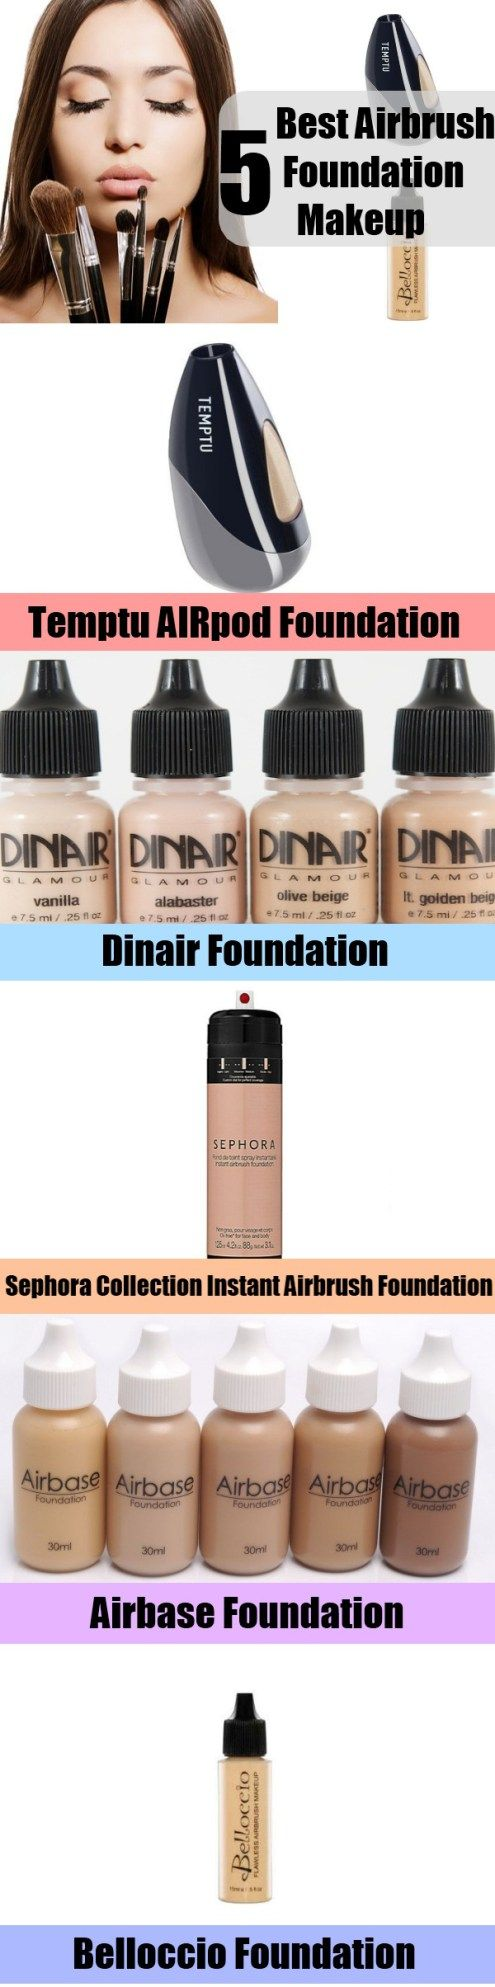 Best 5 Airbrush Foundation Makeup